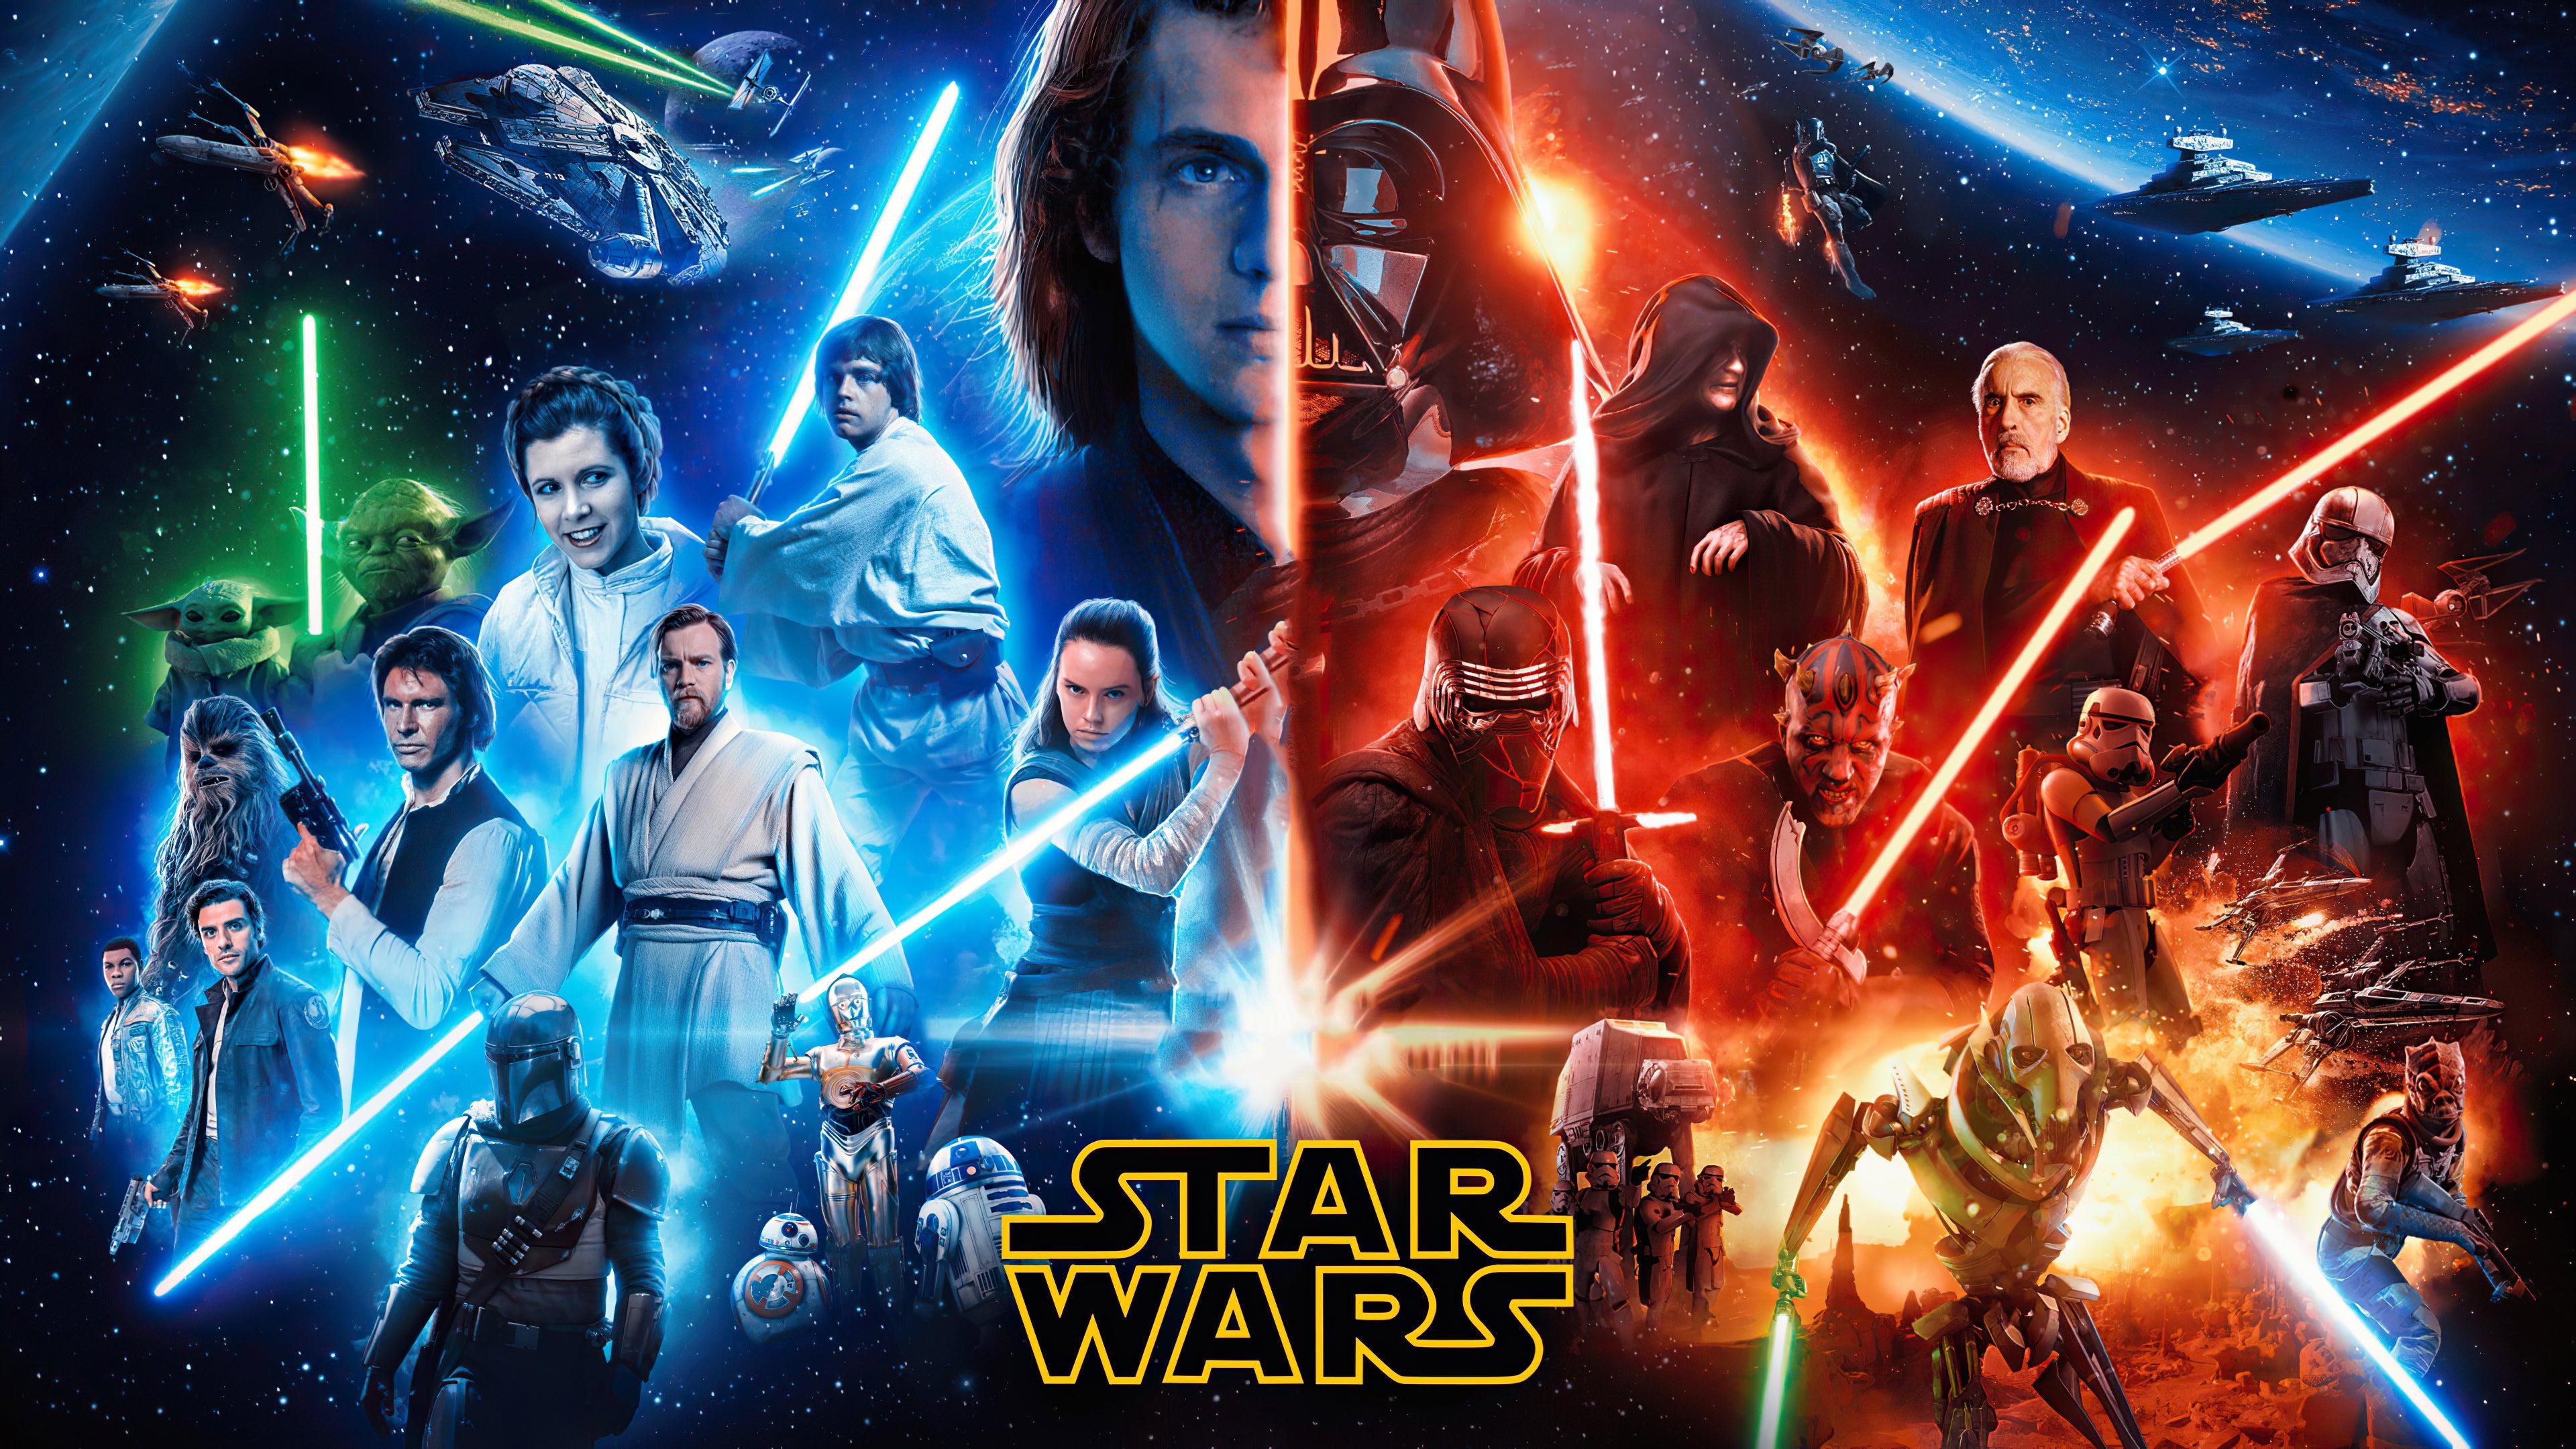 Star Wars 4k Ultra Hd Wallpaper Background Image 3840x2160 Id 1113894 Wallpaper Abyss